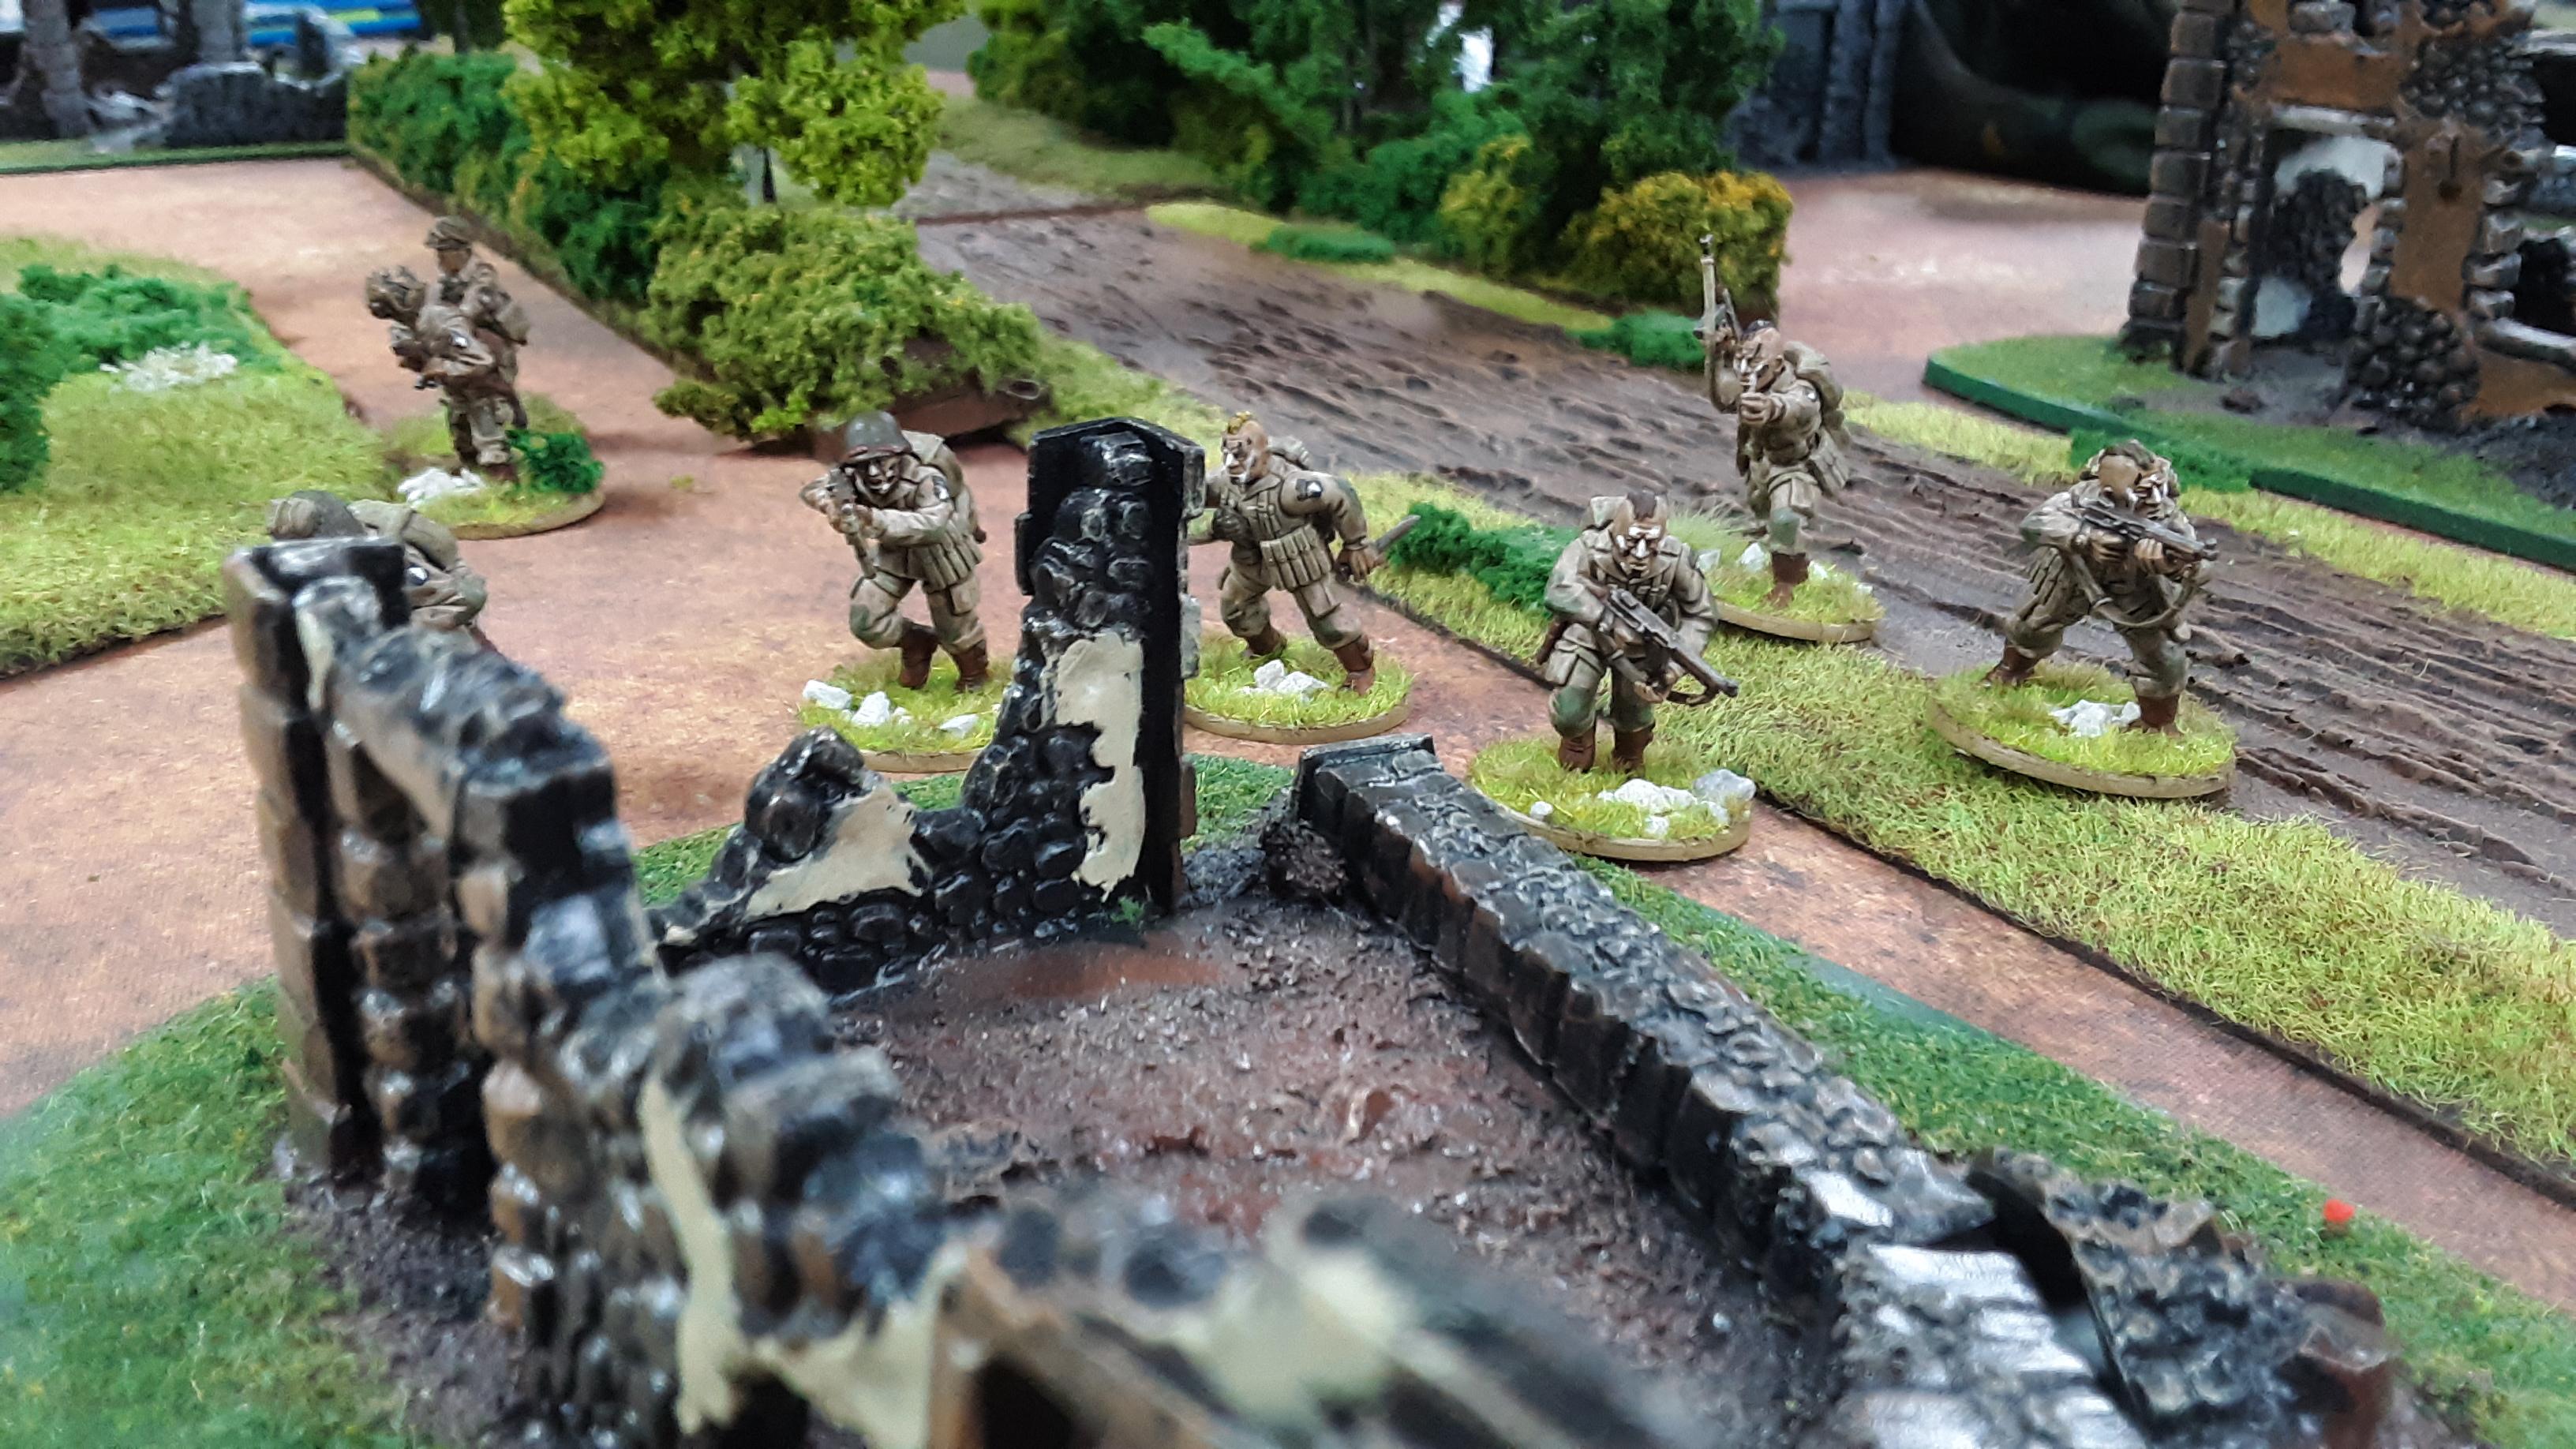 289th Infantry Regiment versus 352nd Pionier Battalion in a fierce infantry engagement